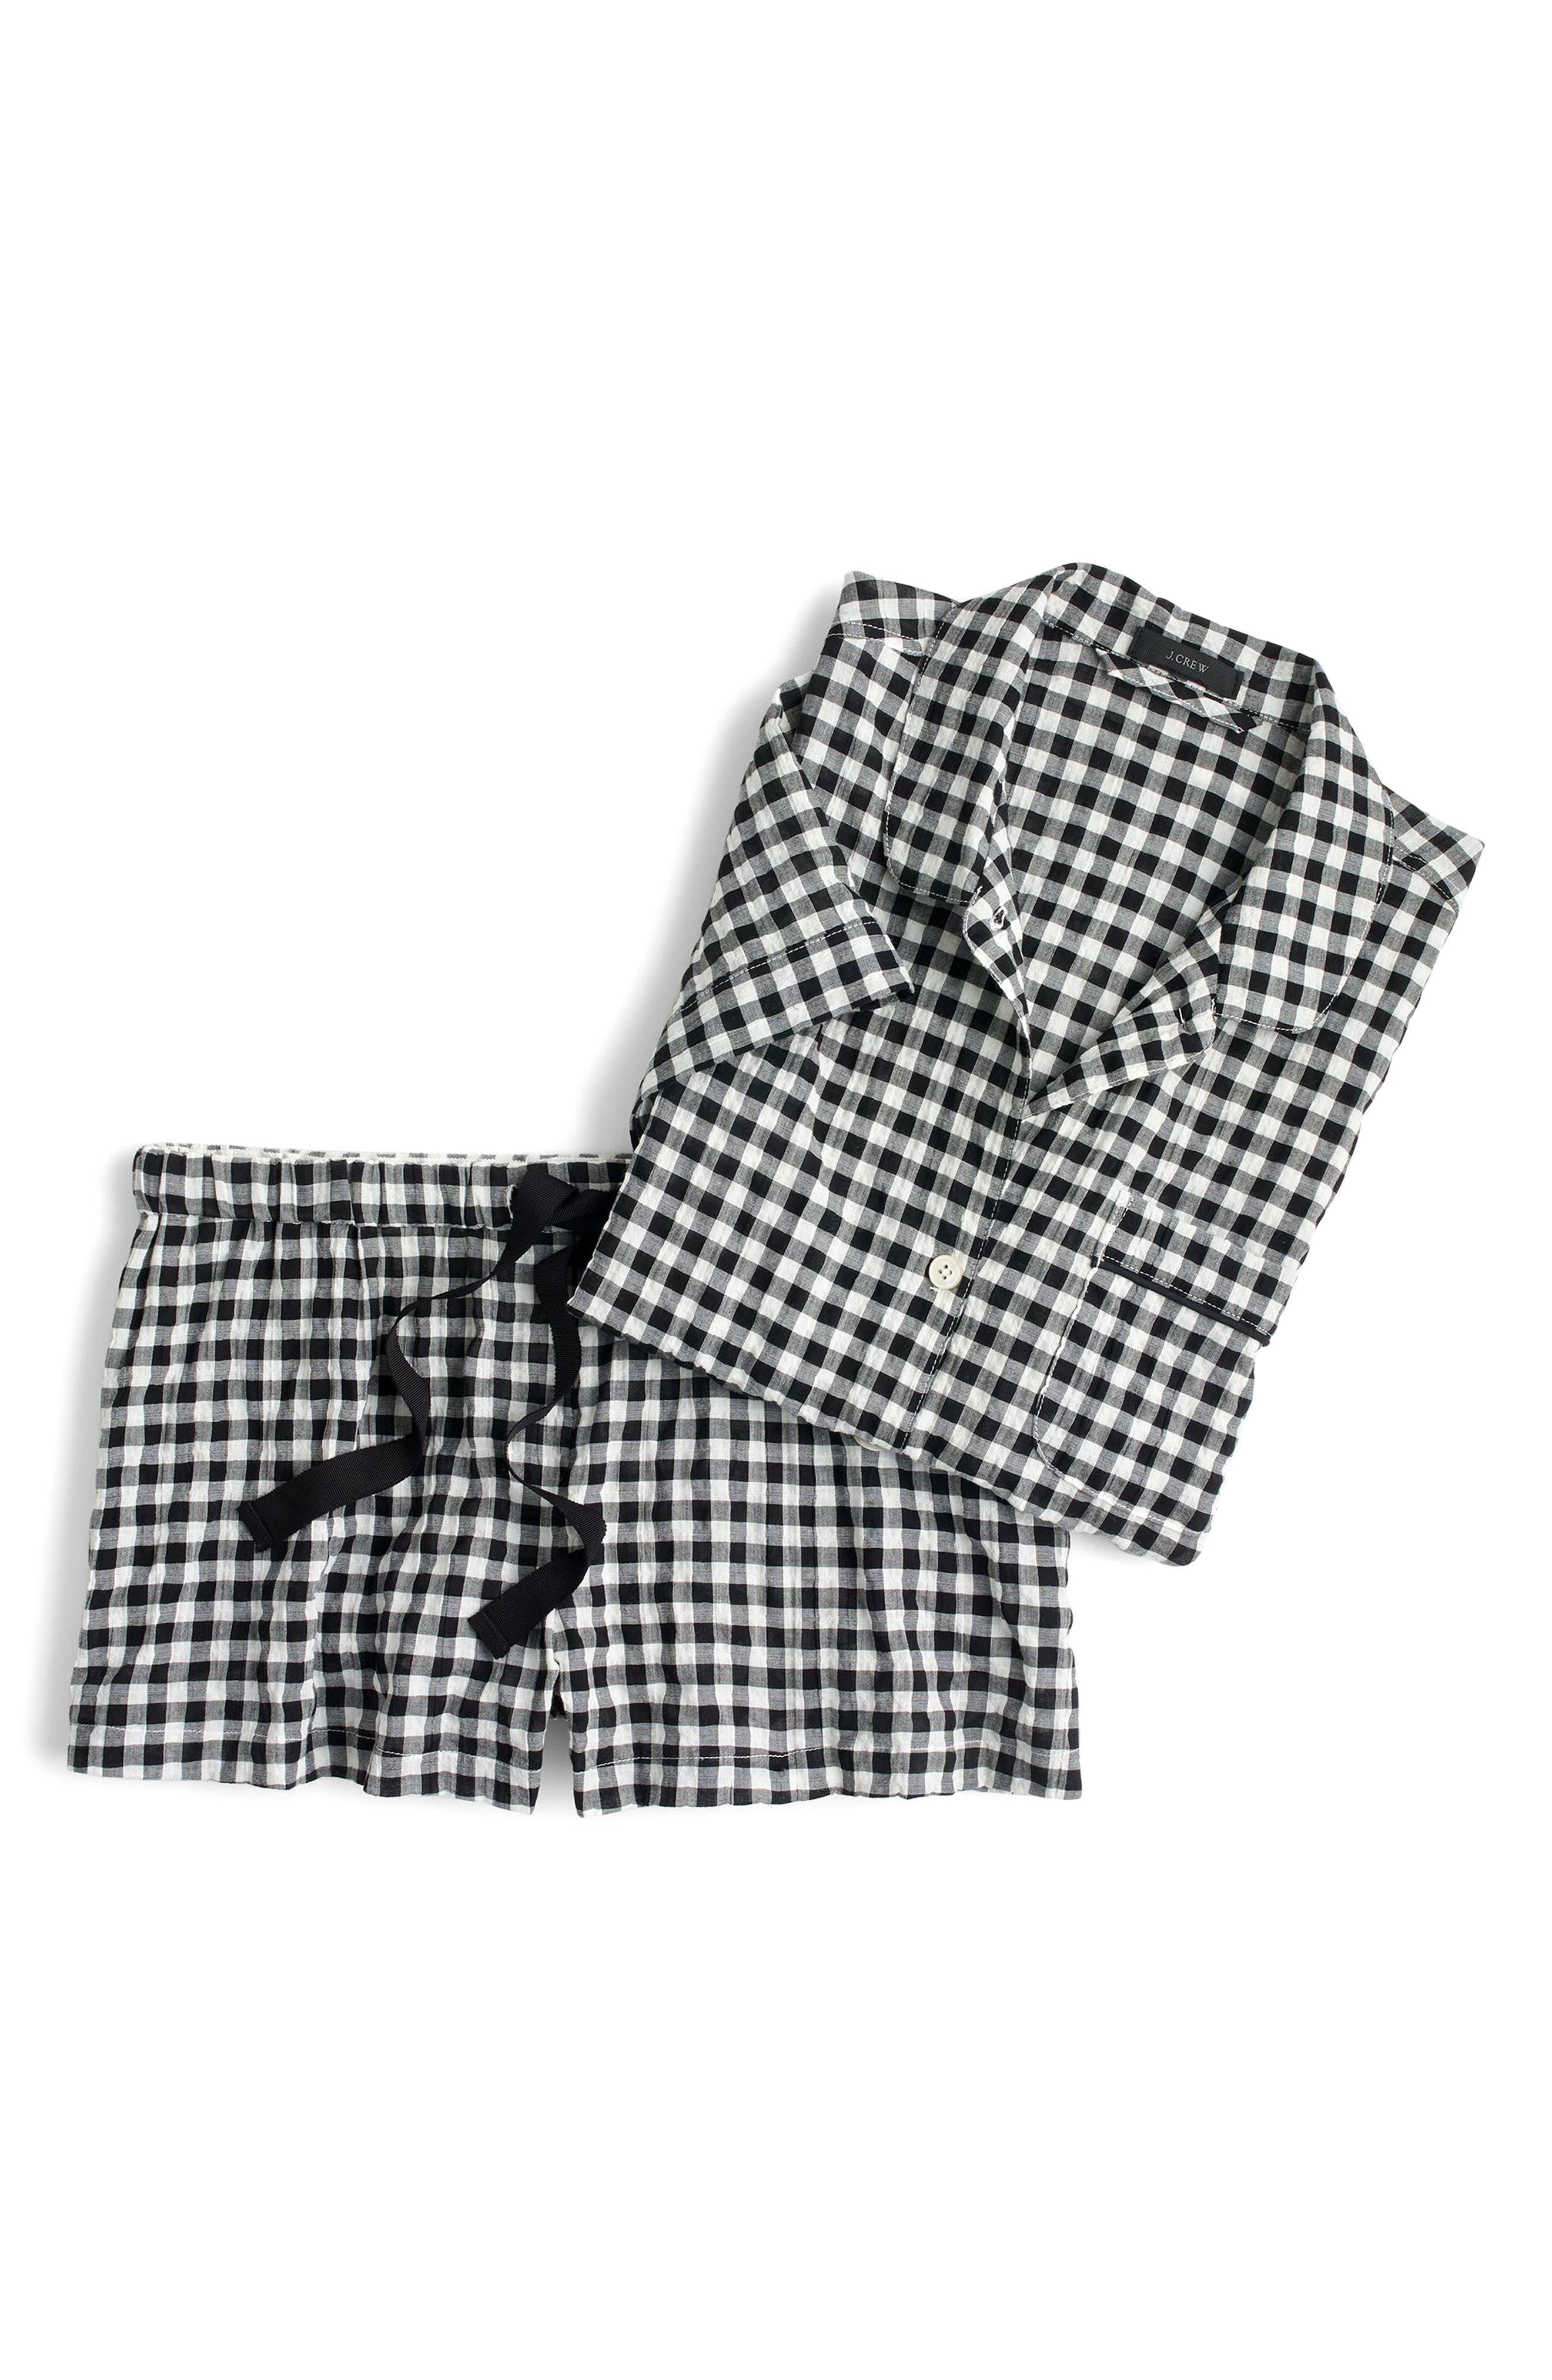 J.Crew Gingham Pajama Set,                         Main,                         color, Ivory Black